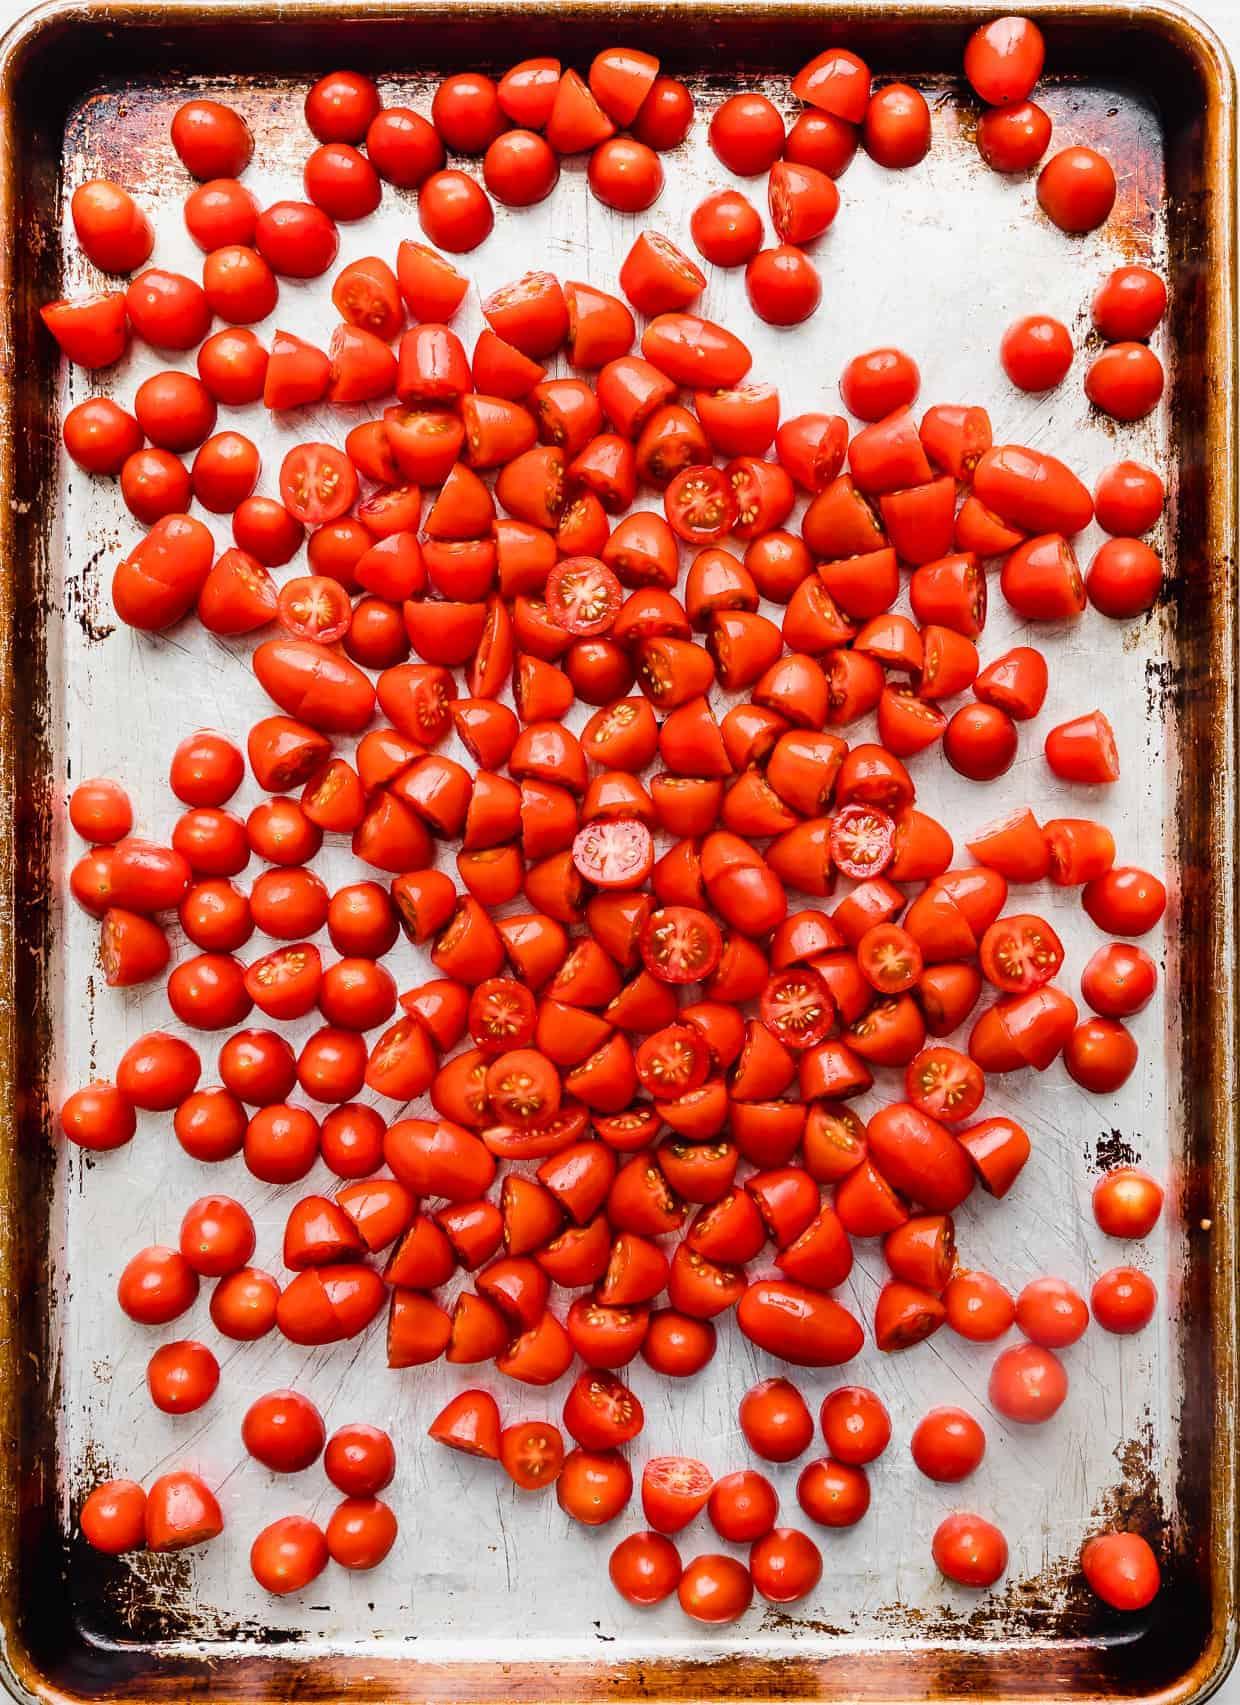 Grape tomatoes on a baking sheet.